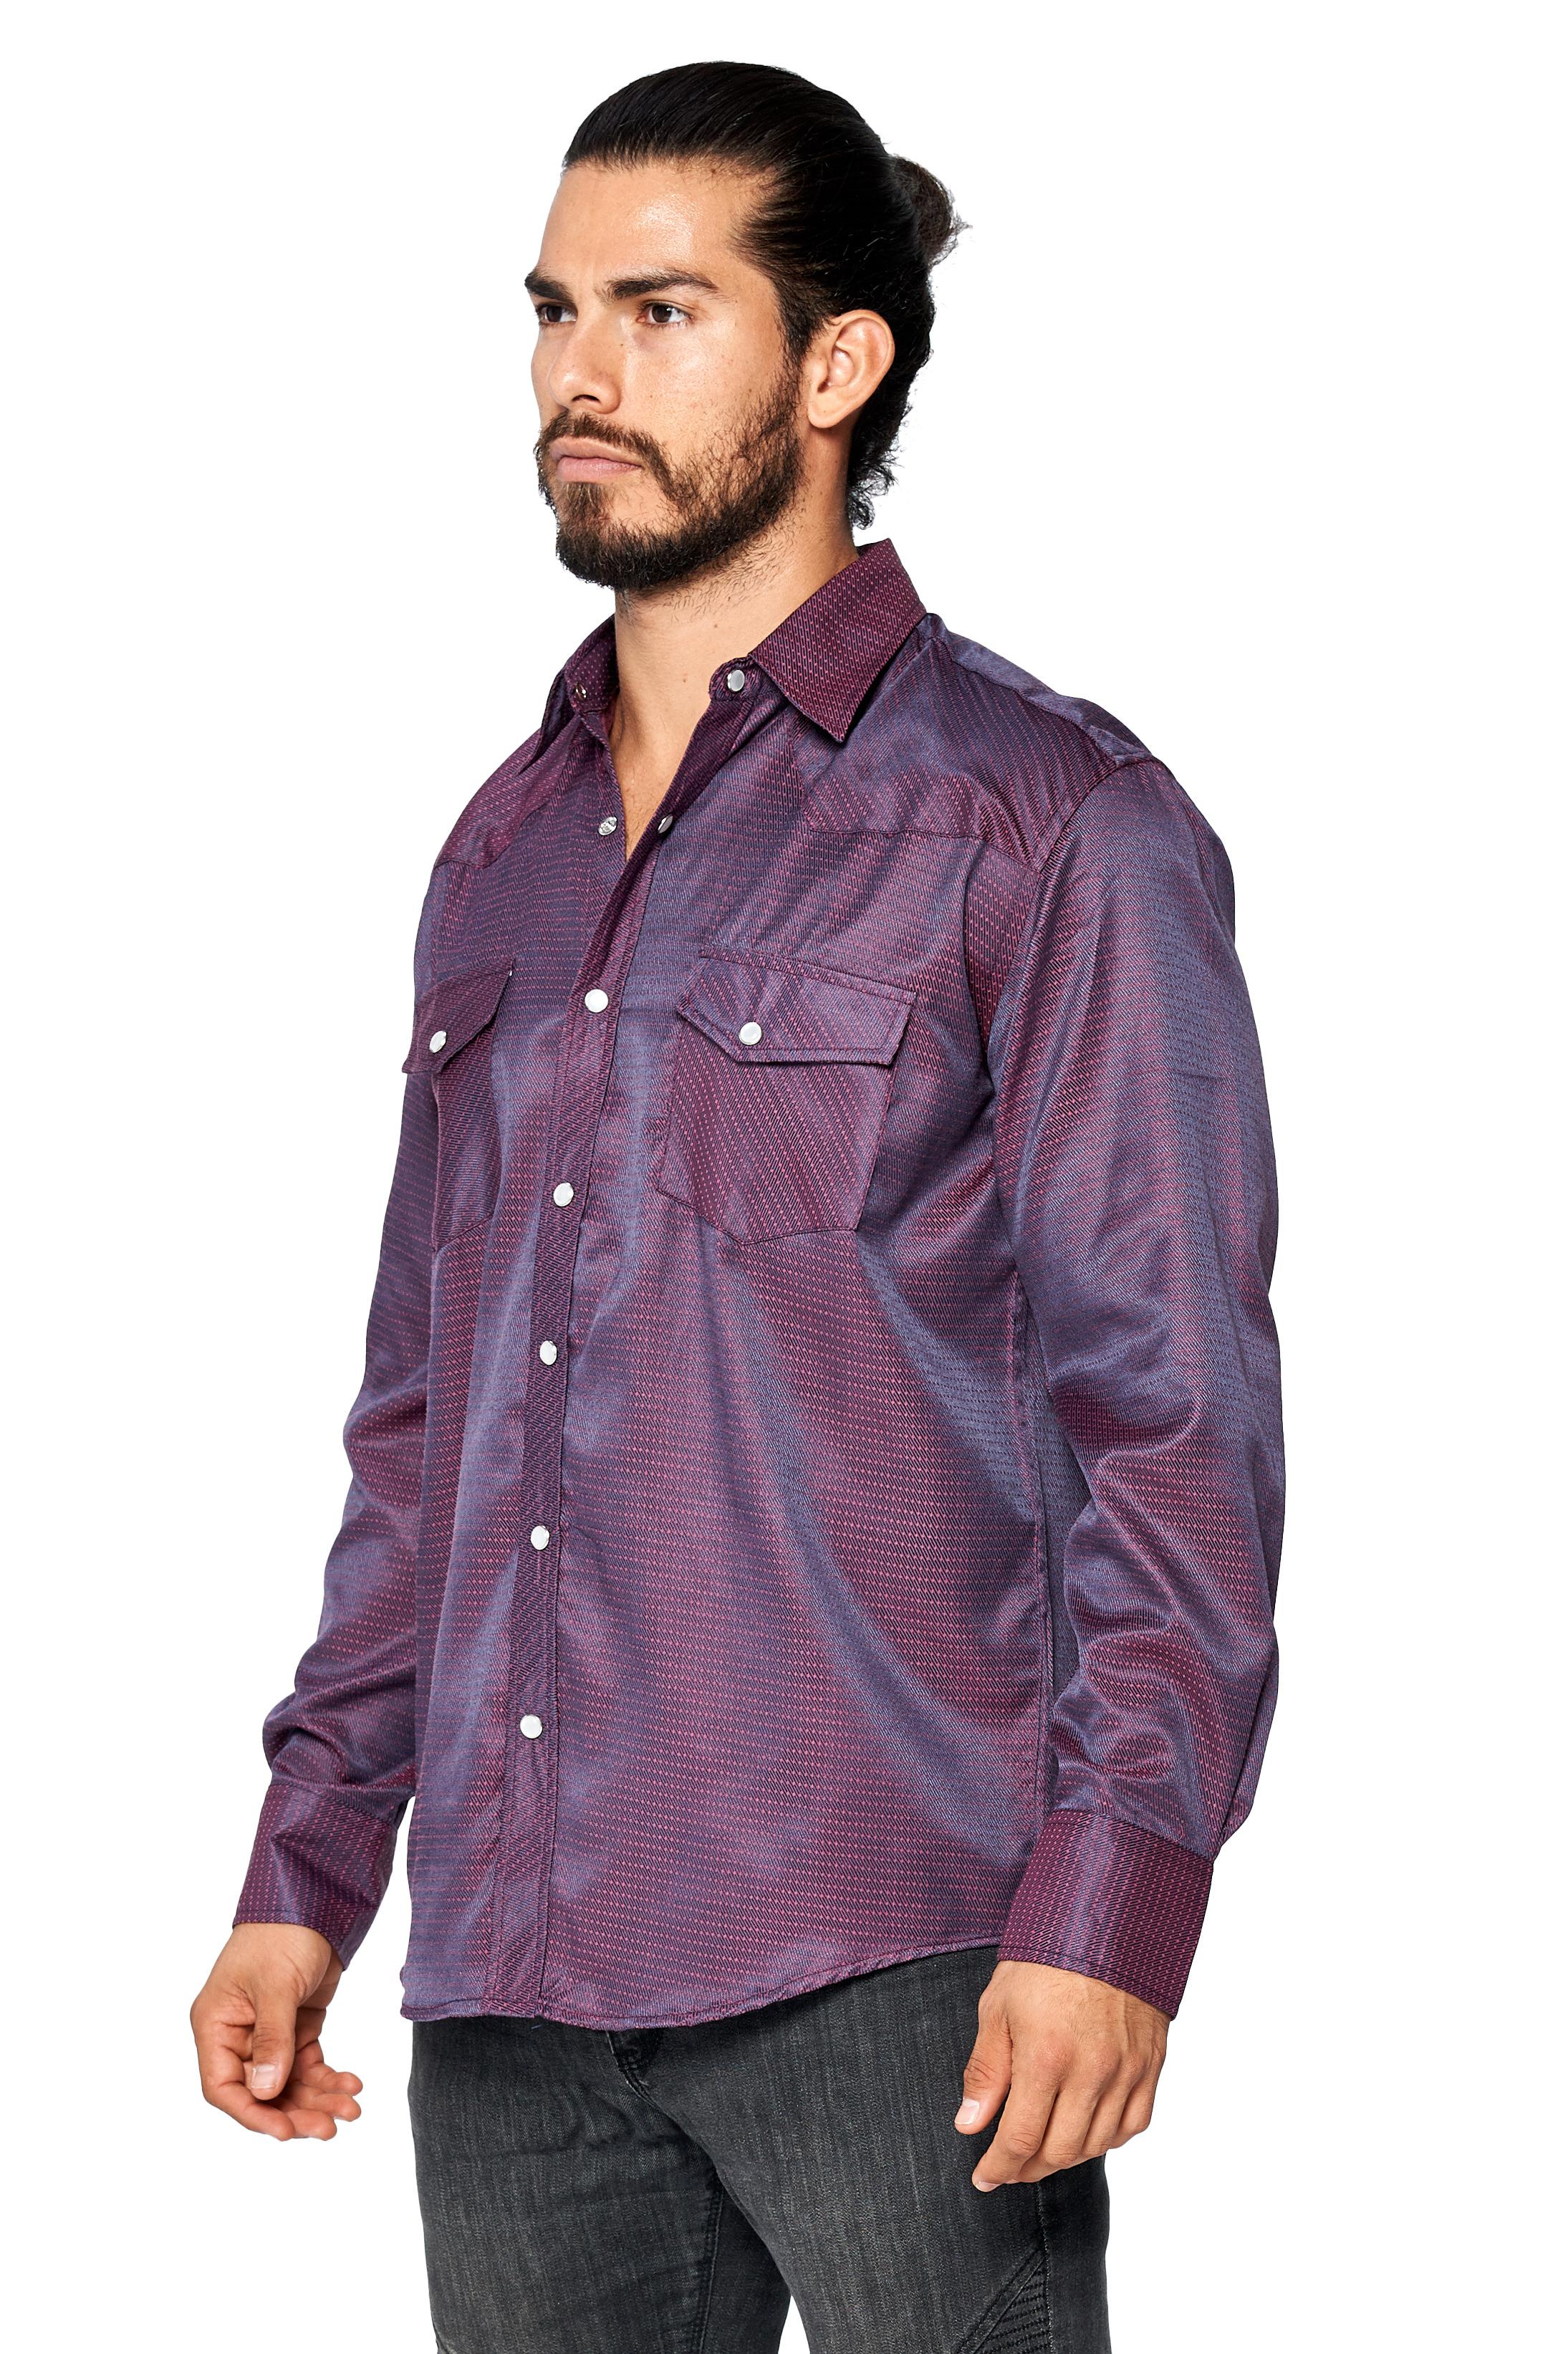 LW-Men-039-s-Pearl-Snap-Tribal-Stylish-Printed-Woven-Western-Vaquero-Rodeo-Shirt thumbnail 37